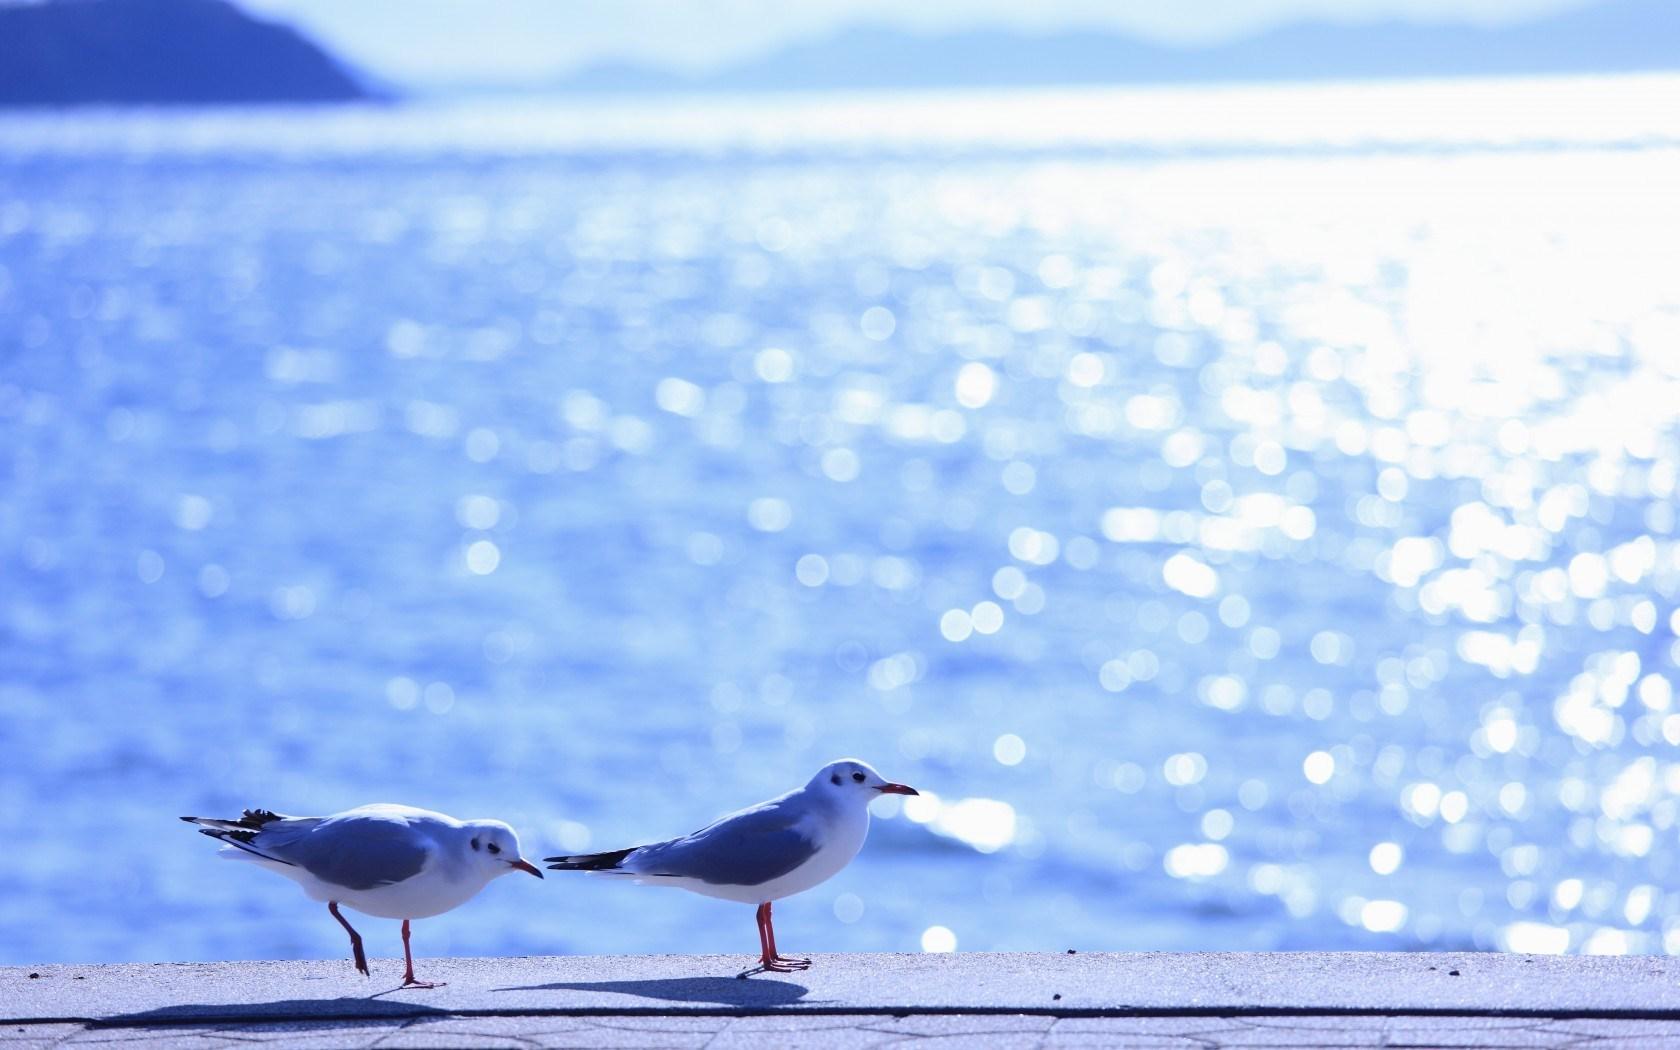 gull wallpaper 1080p